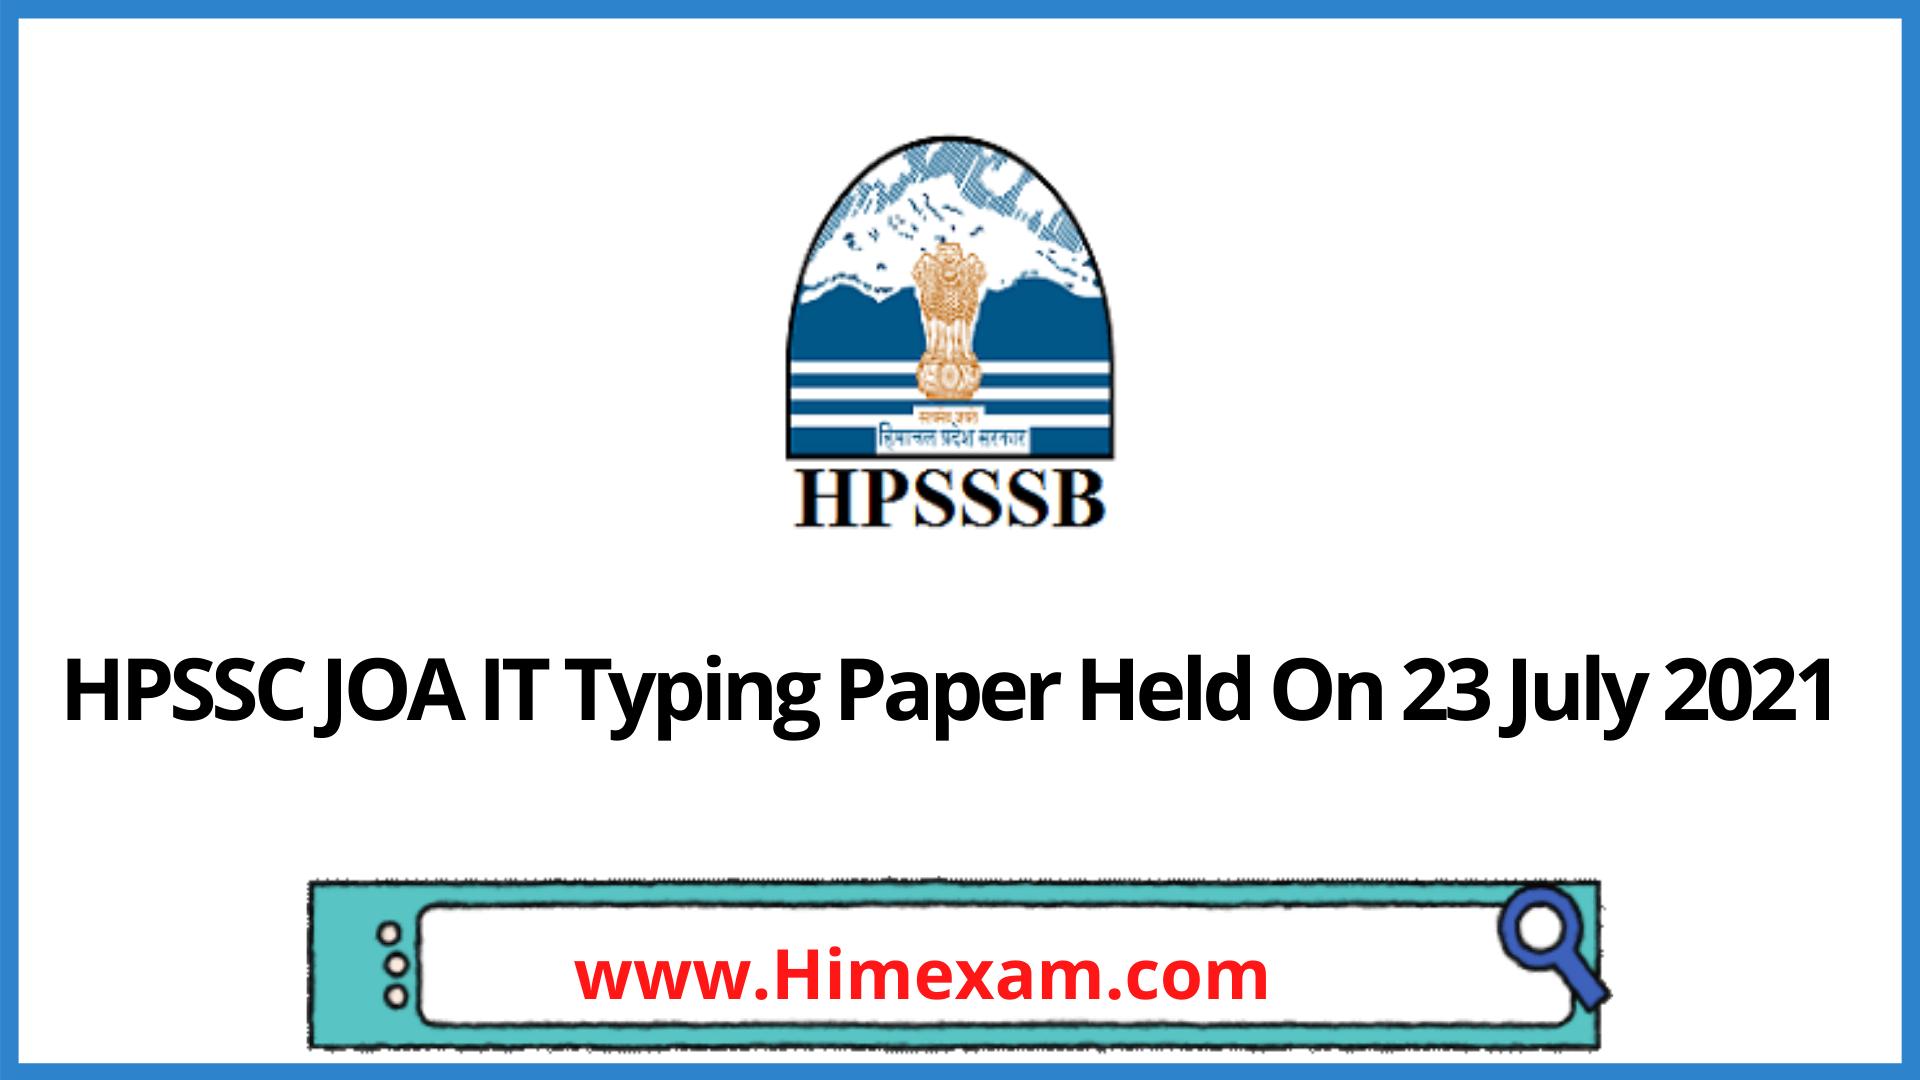 HPSSC JOA IT Typing Paper Held On 23 July 2021